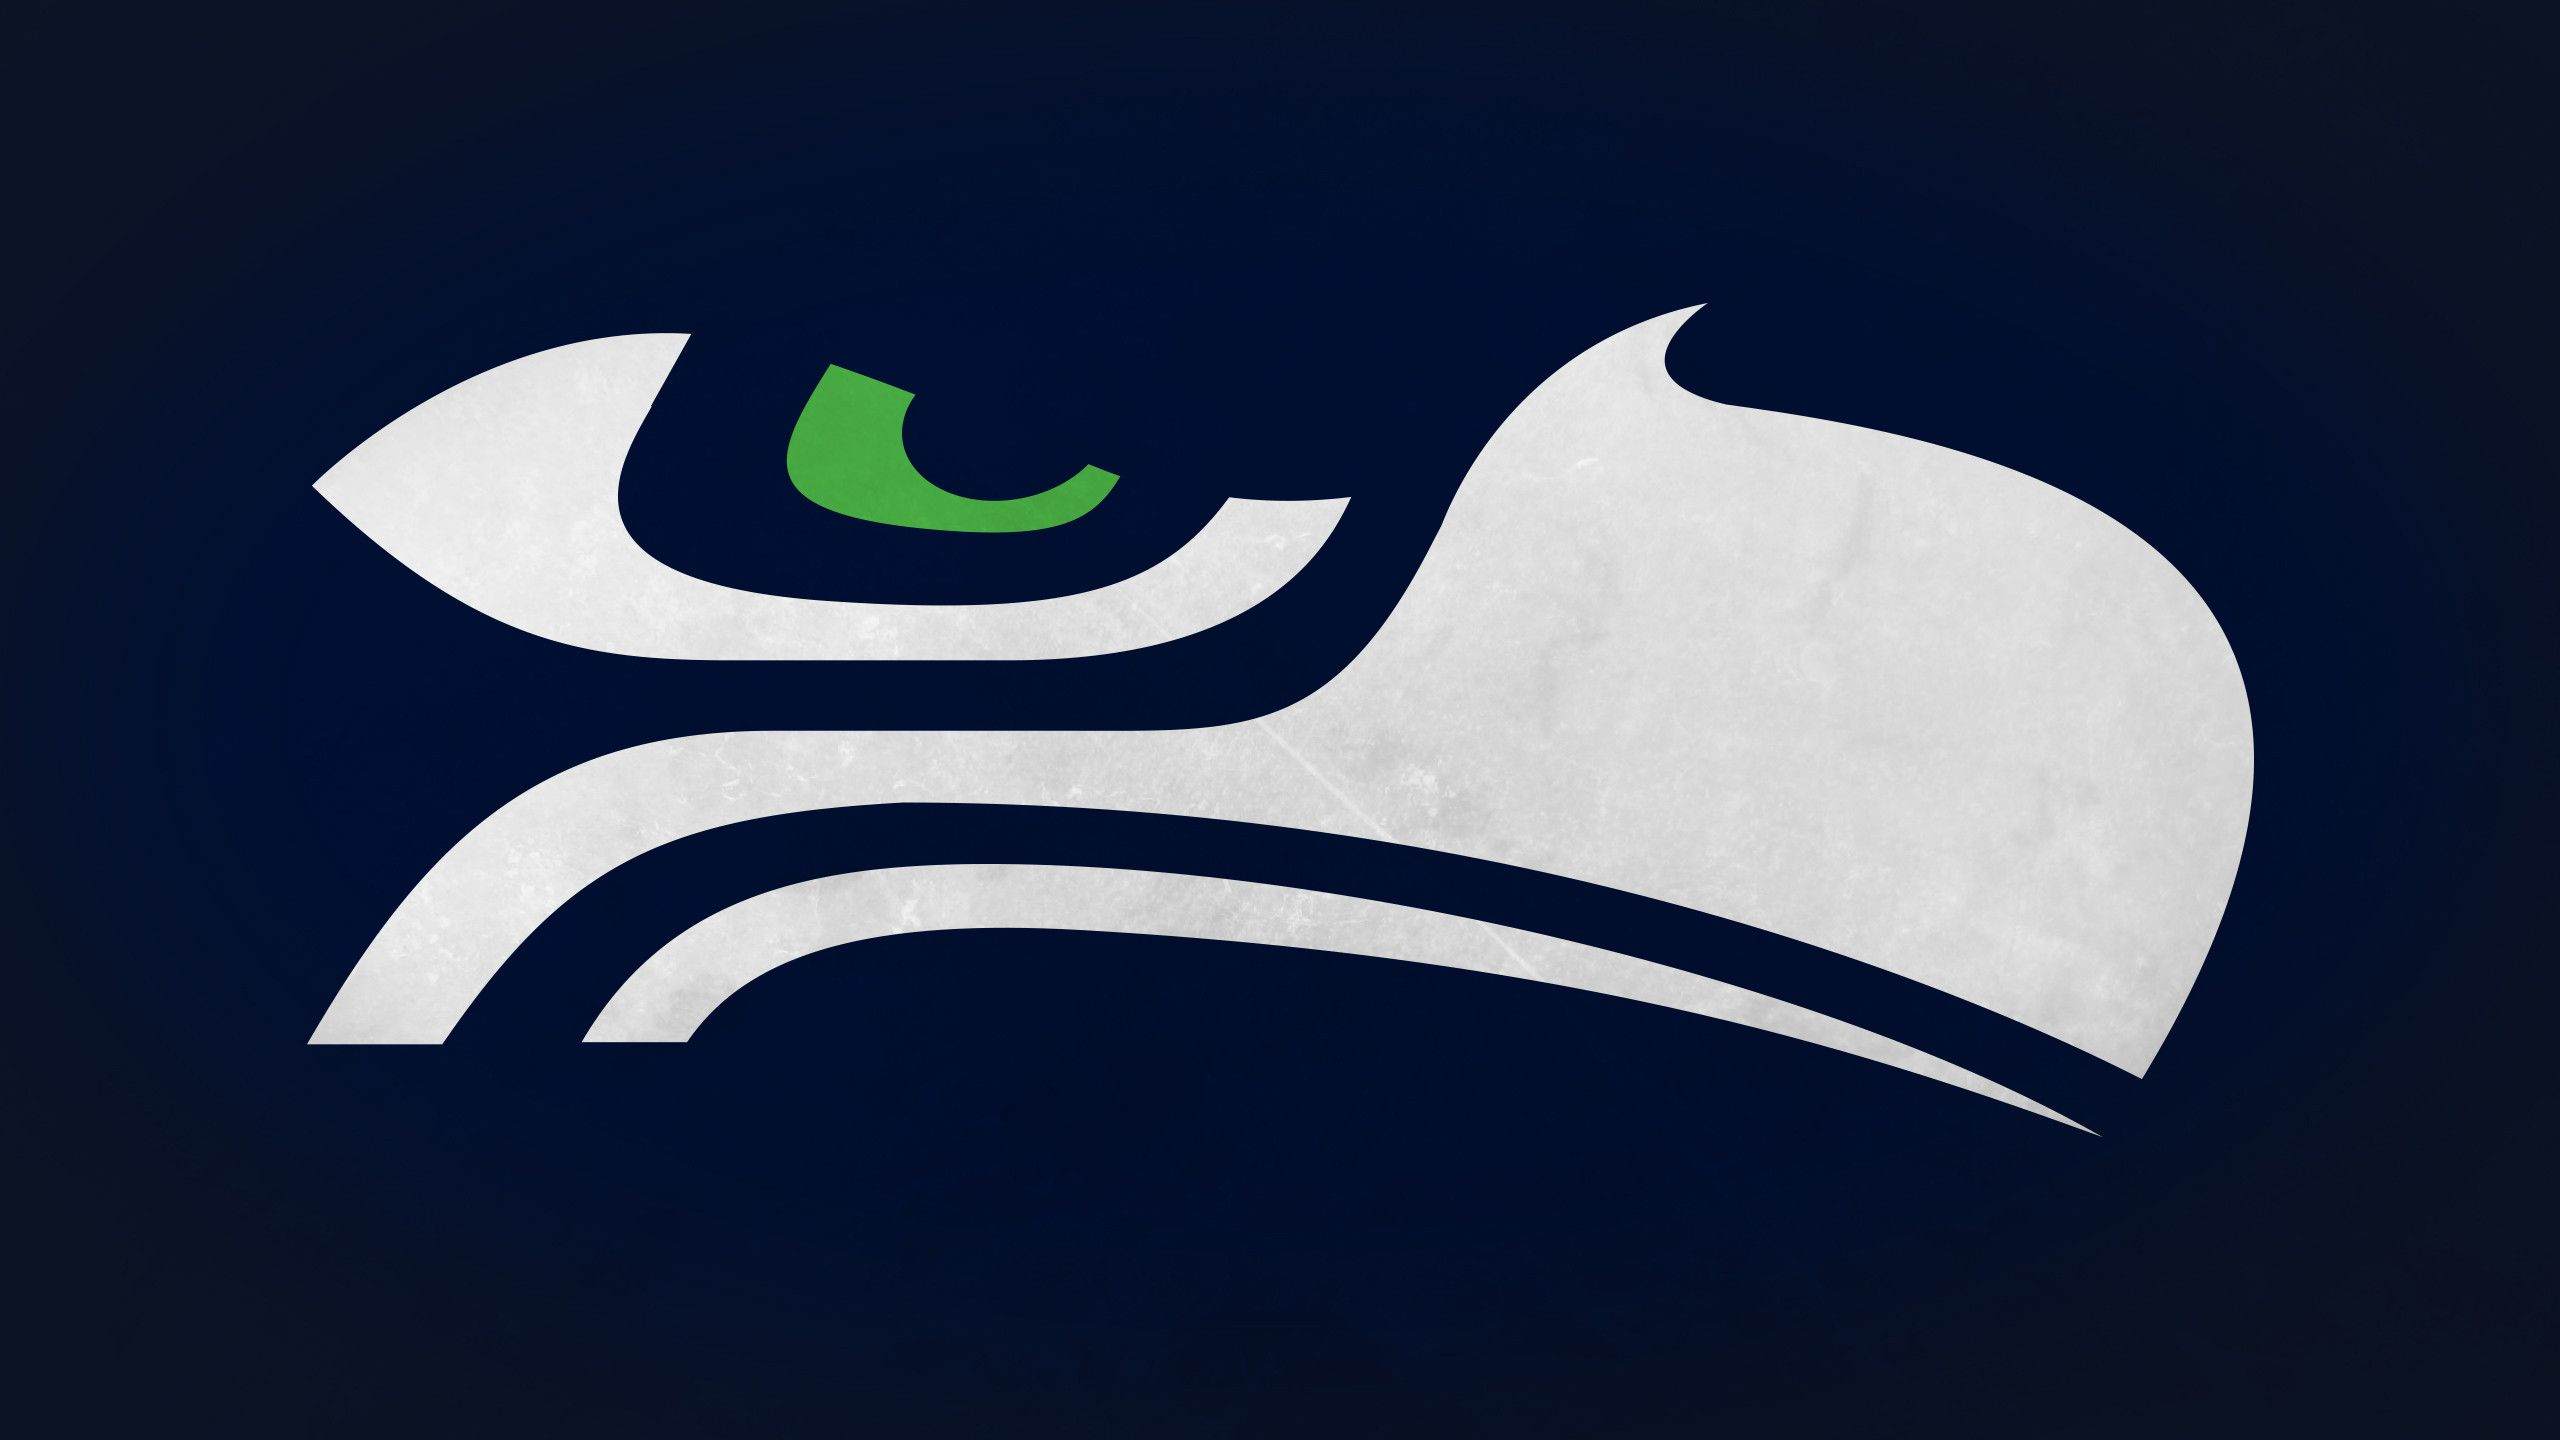 Image for Seattle Seahawks Logo Vector Seattle seahawks logo